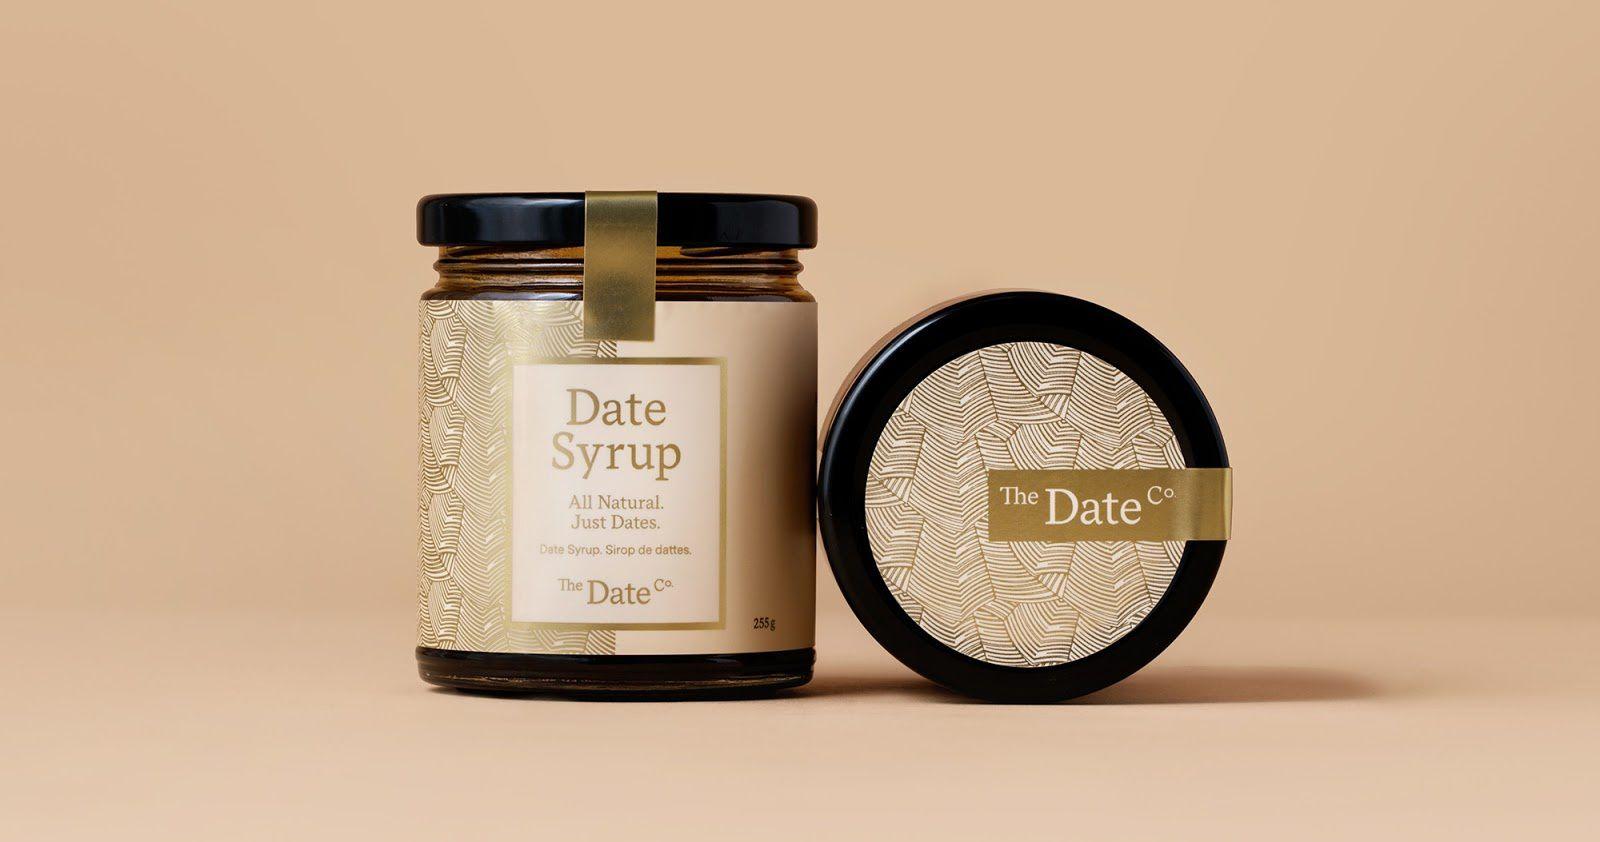 he Date Co (spécialités à base de dattes) I Design : Glasfurd & Walker, Vancouver, Canada (juin 2017)